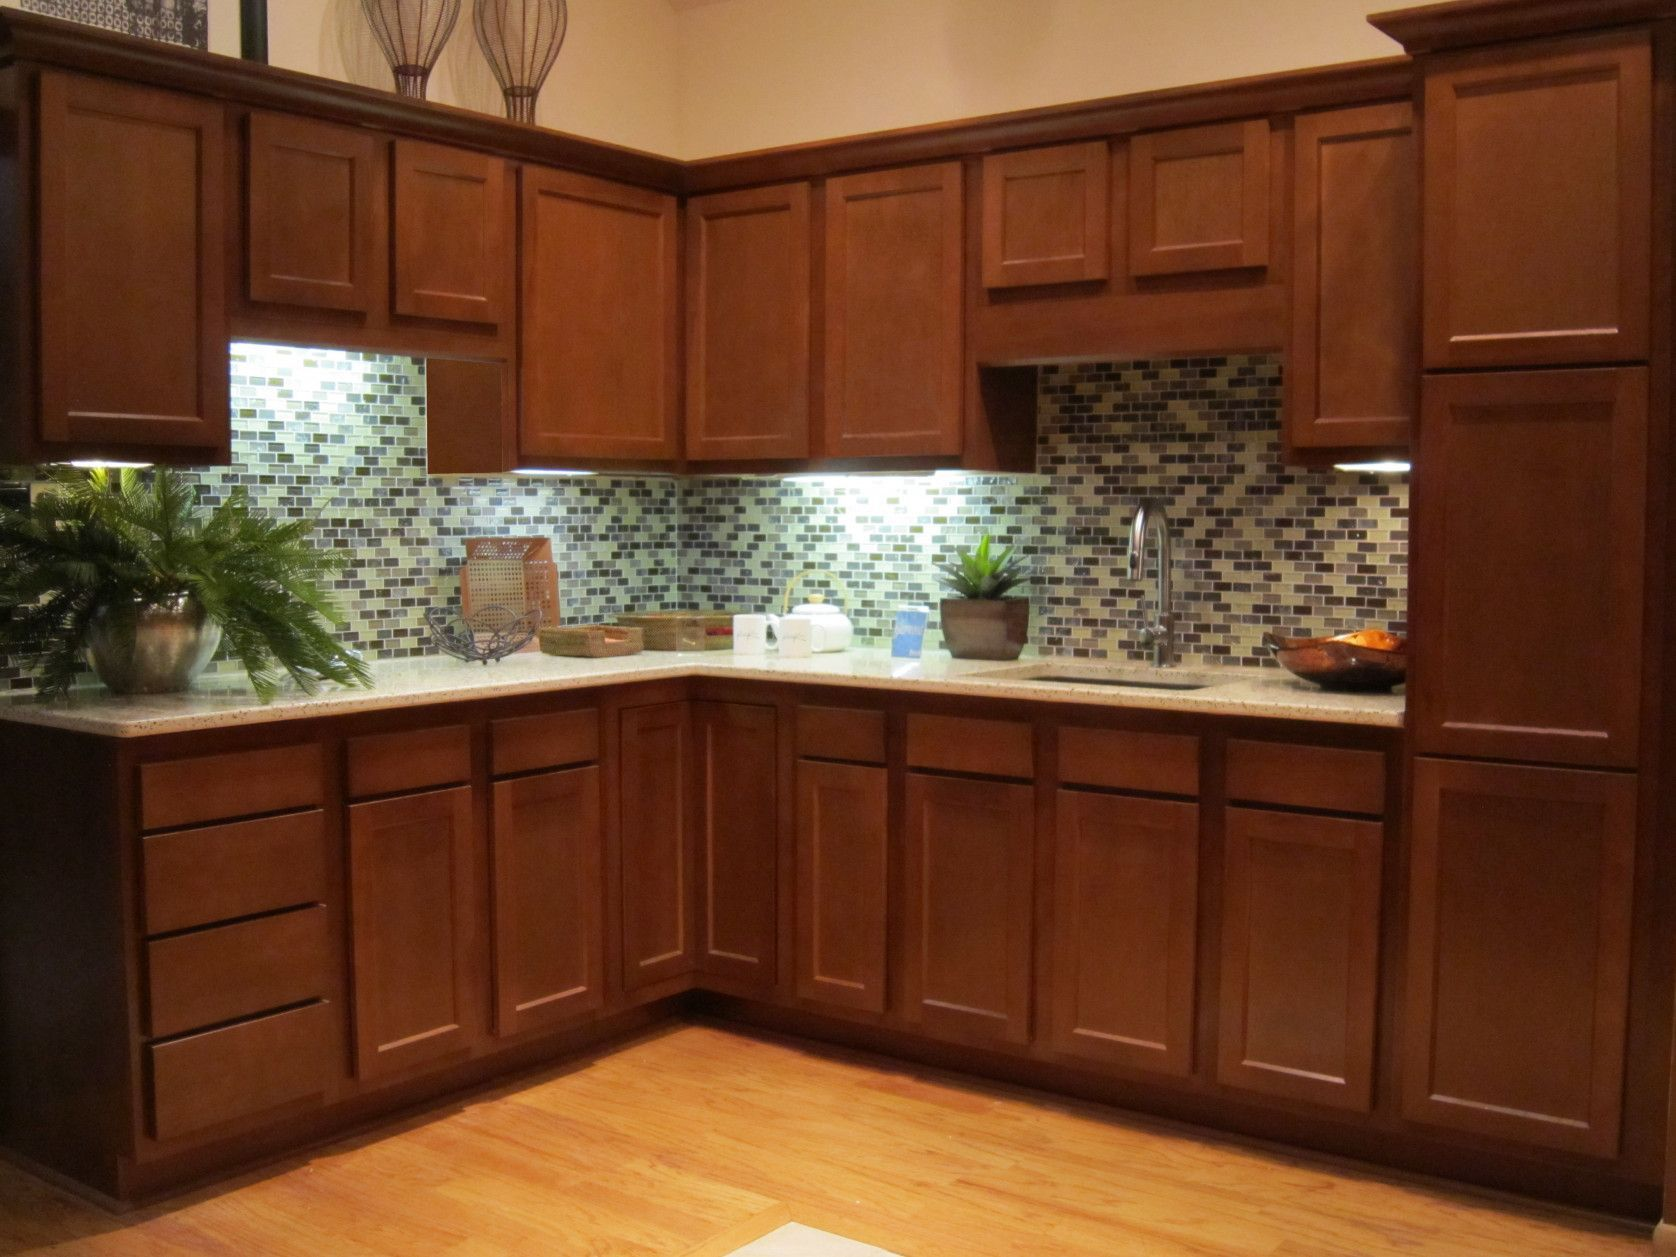 96 Best Glenwood Kitchen Reviews For Home